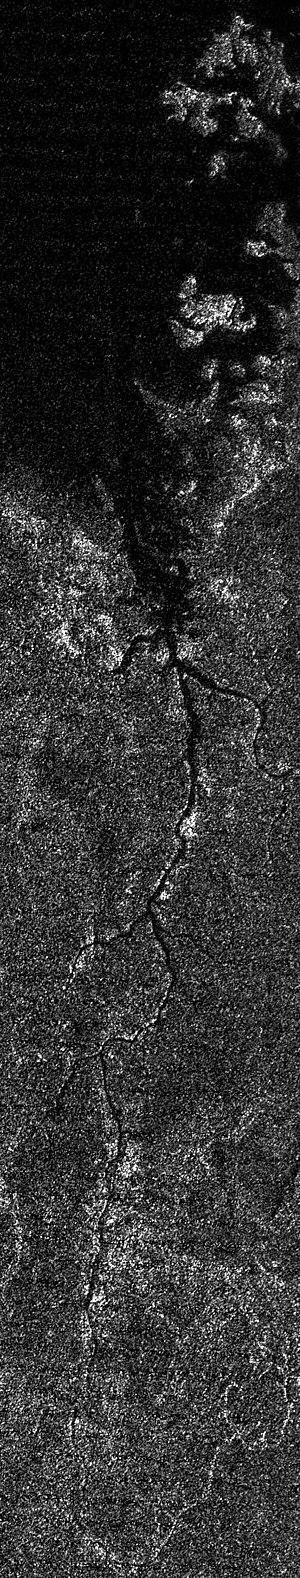 Vid Flumina - Synthetic aperture radar image mosaic of Titan's north polar region